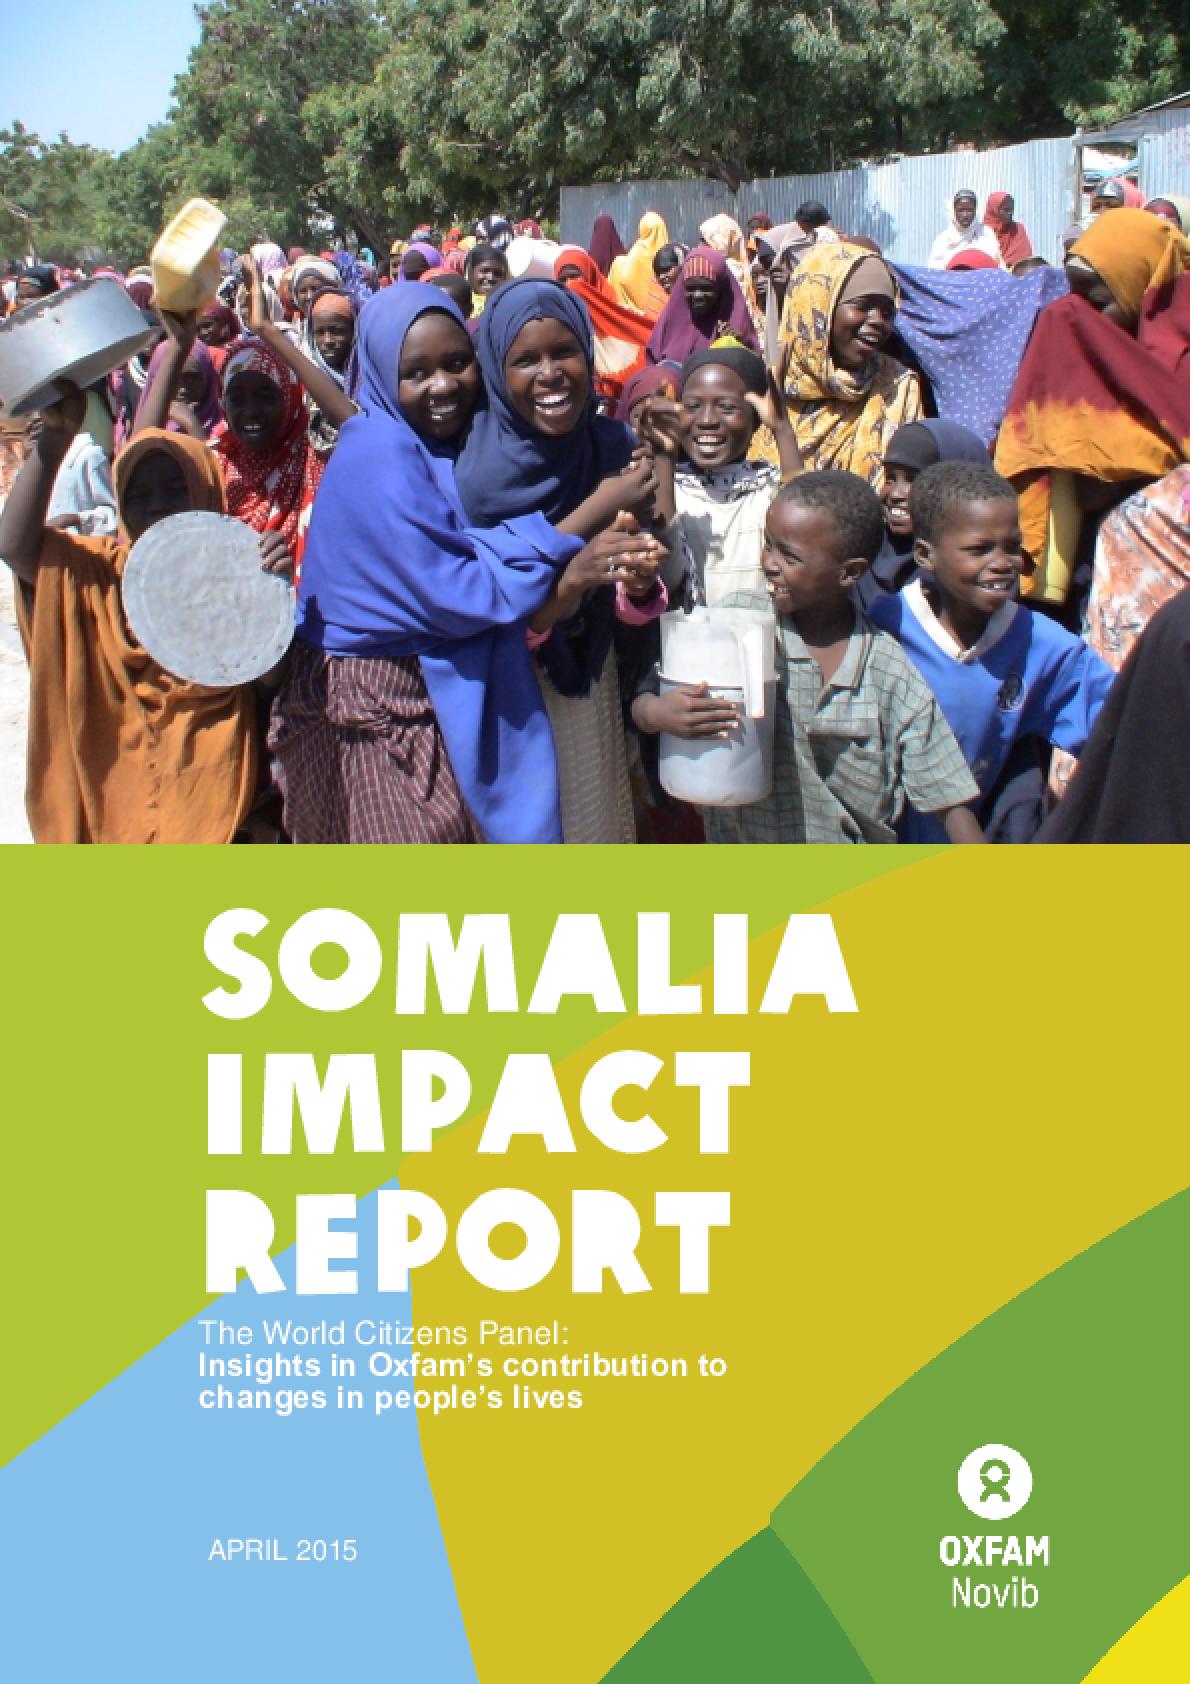 Somalia Impact Report: The World Citizens Panel